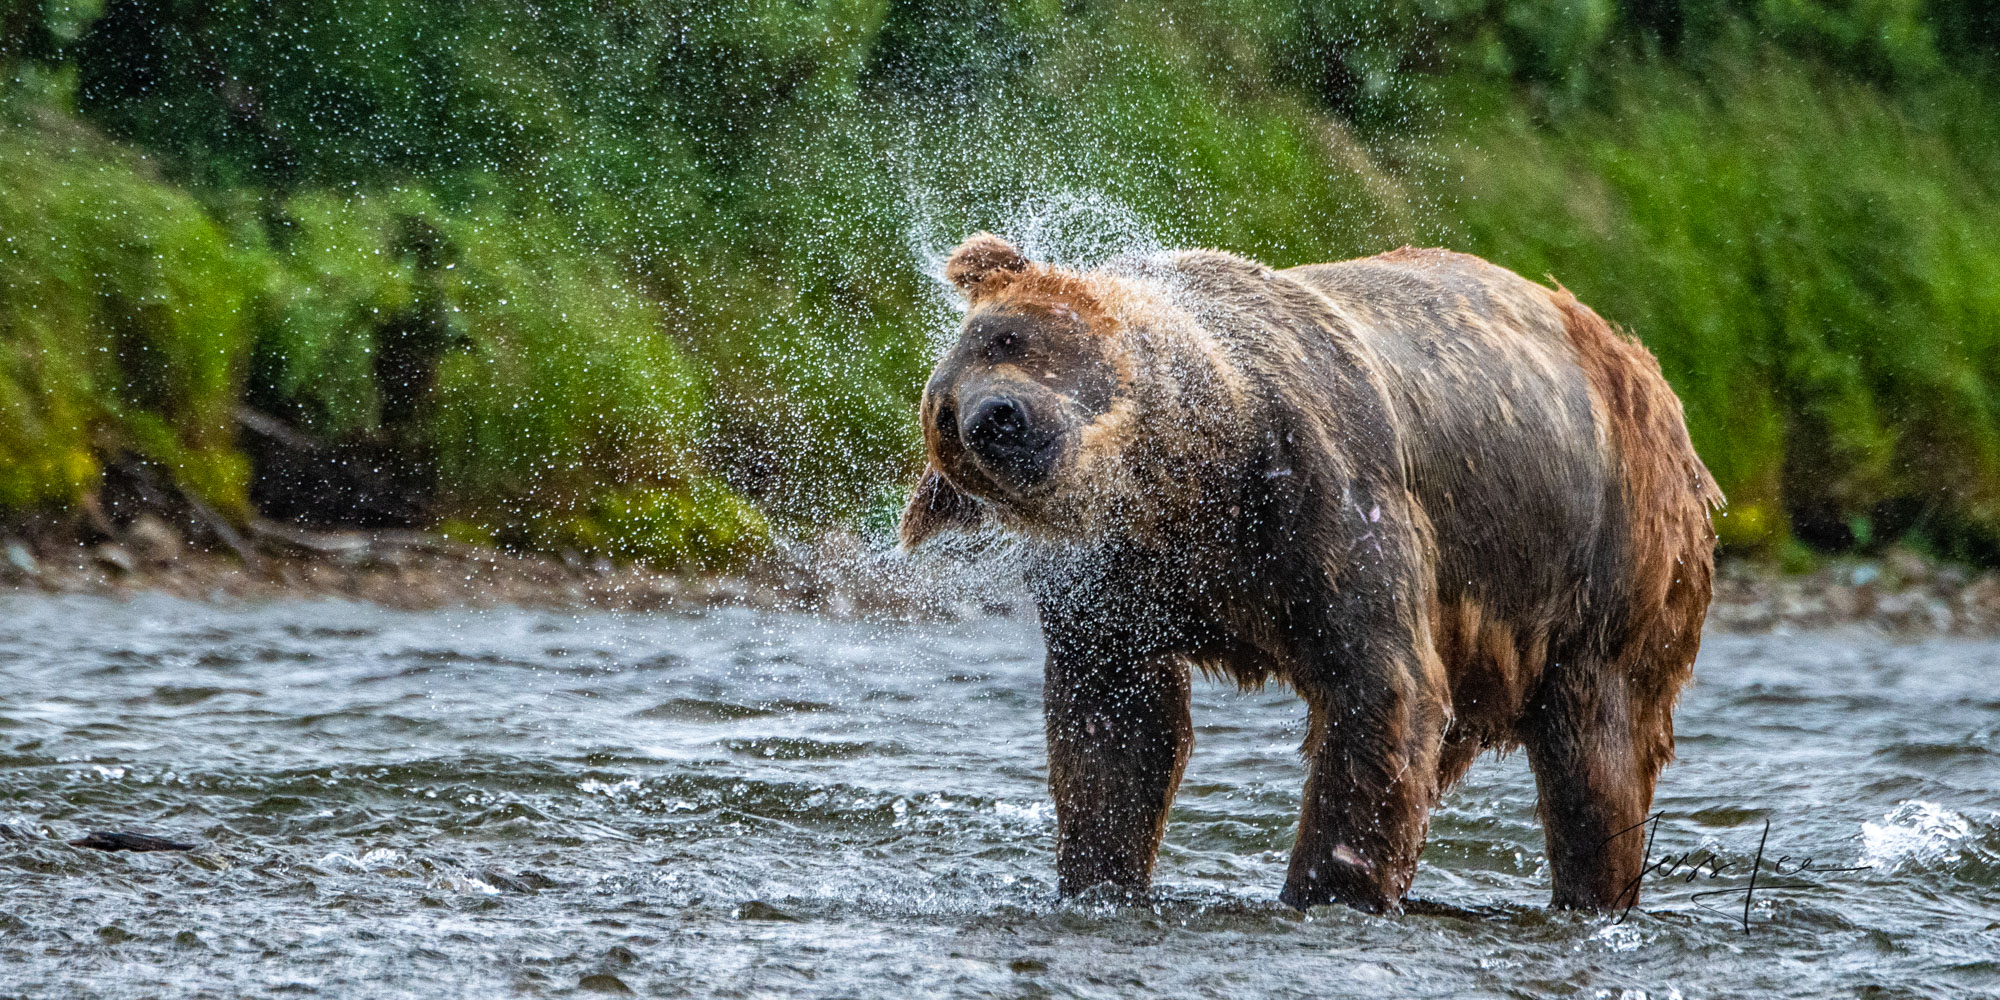 Grizzly, brown bear, bear, Alaska, Coastal, salmon. fishing, Grizzly Bear Photograph, Grizzly bear picture, Grizzly bear print, , photo